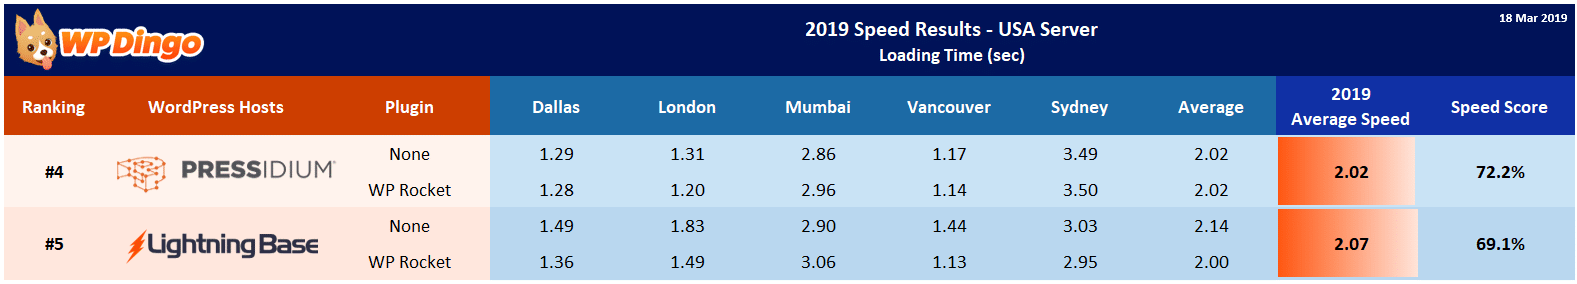 2019 Lightning Base vs Pressidium Speed Table - USA Server